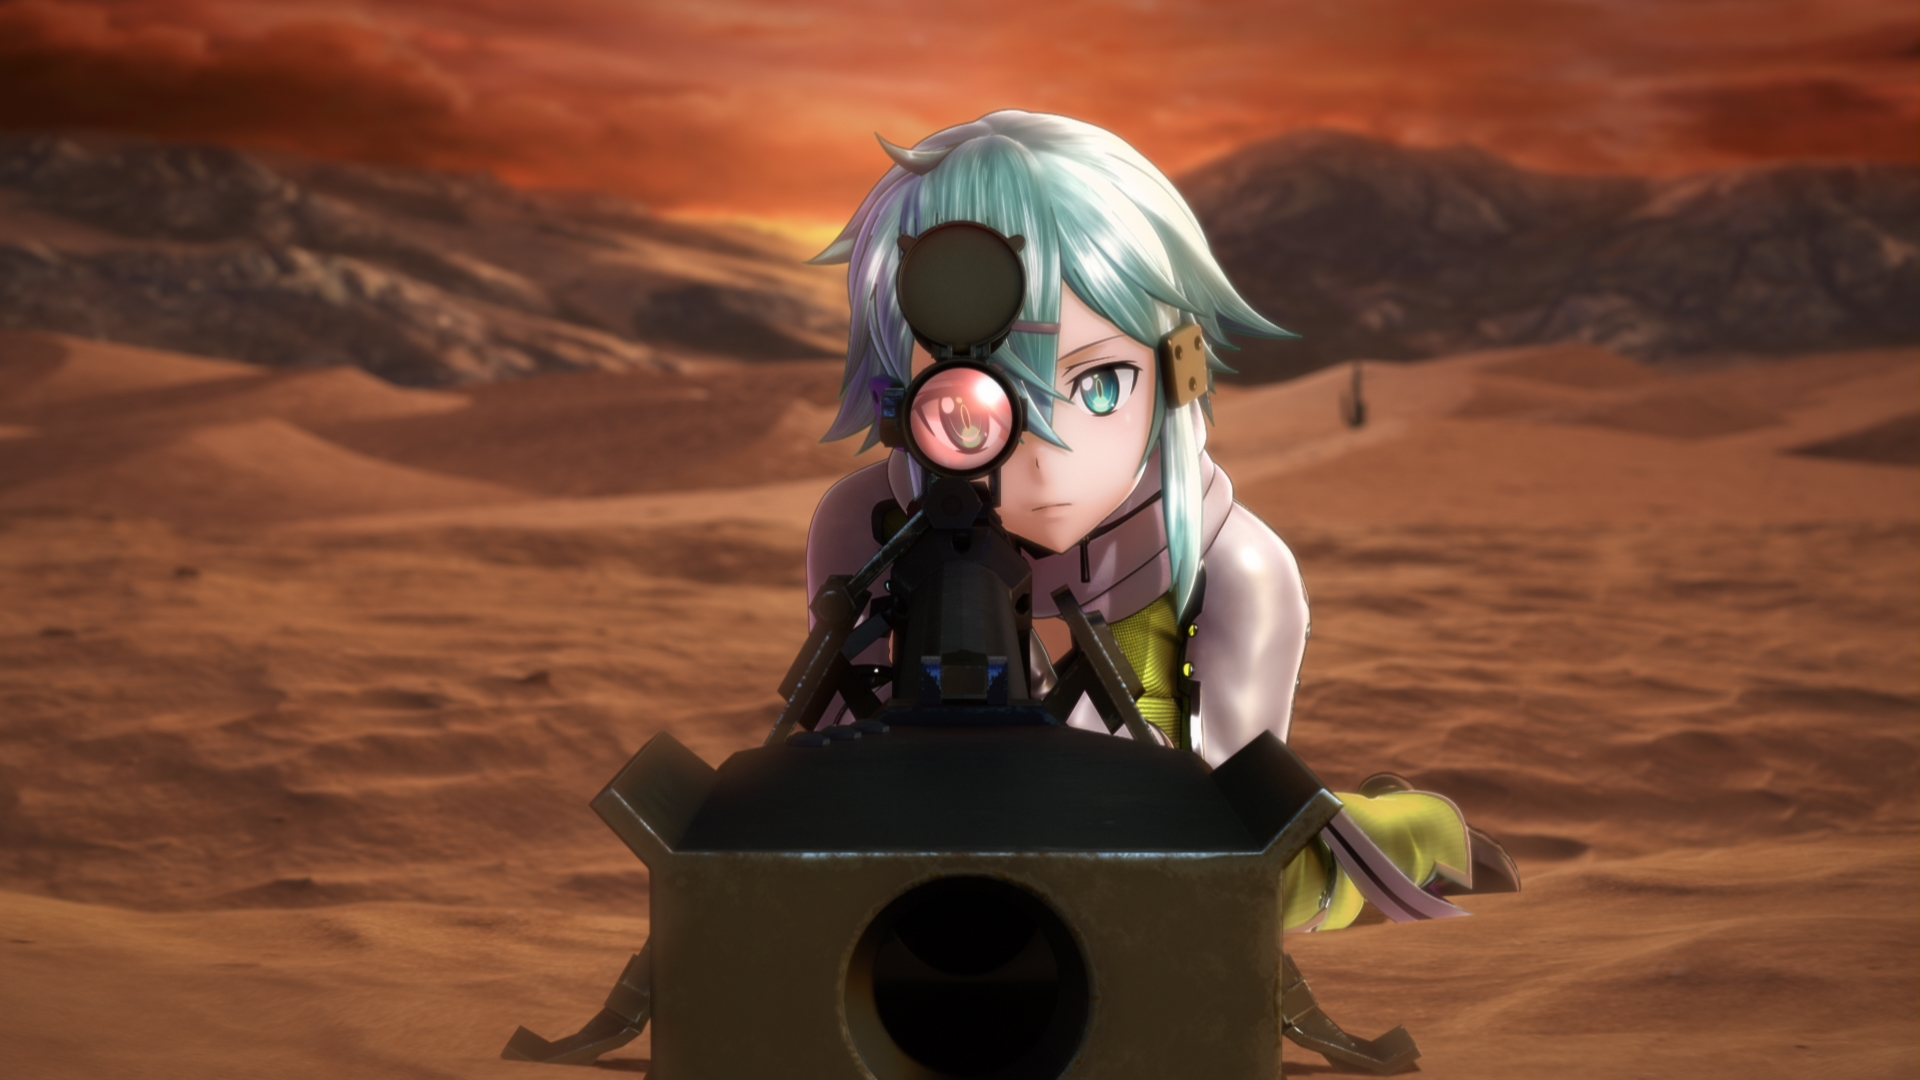 Oznámen Sword Art Online: Fatal Bullet pro PS4, Xbox One a PC 148786